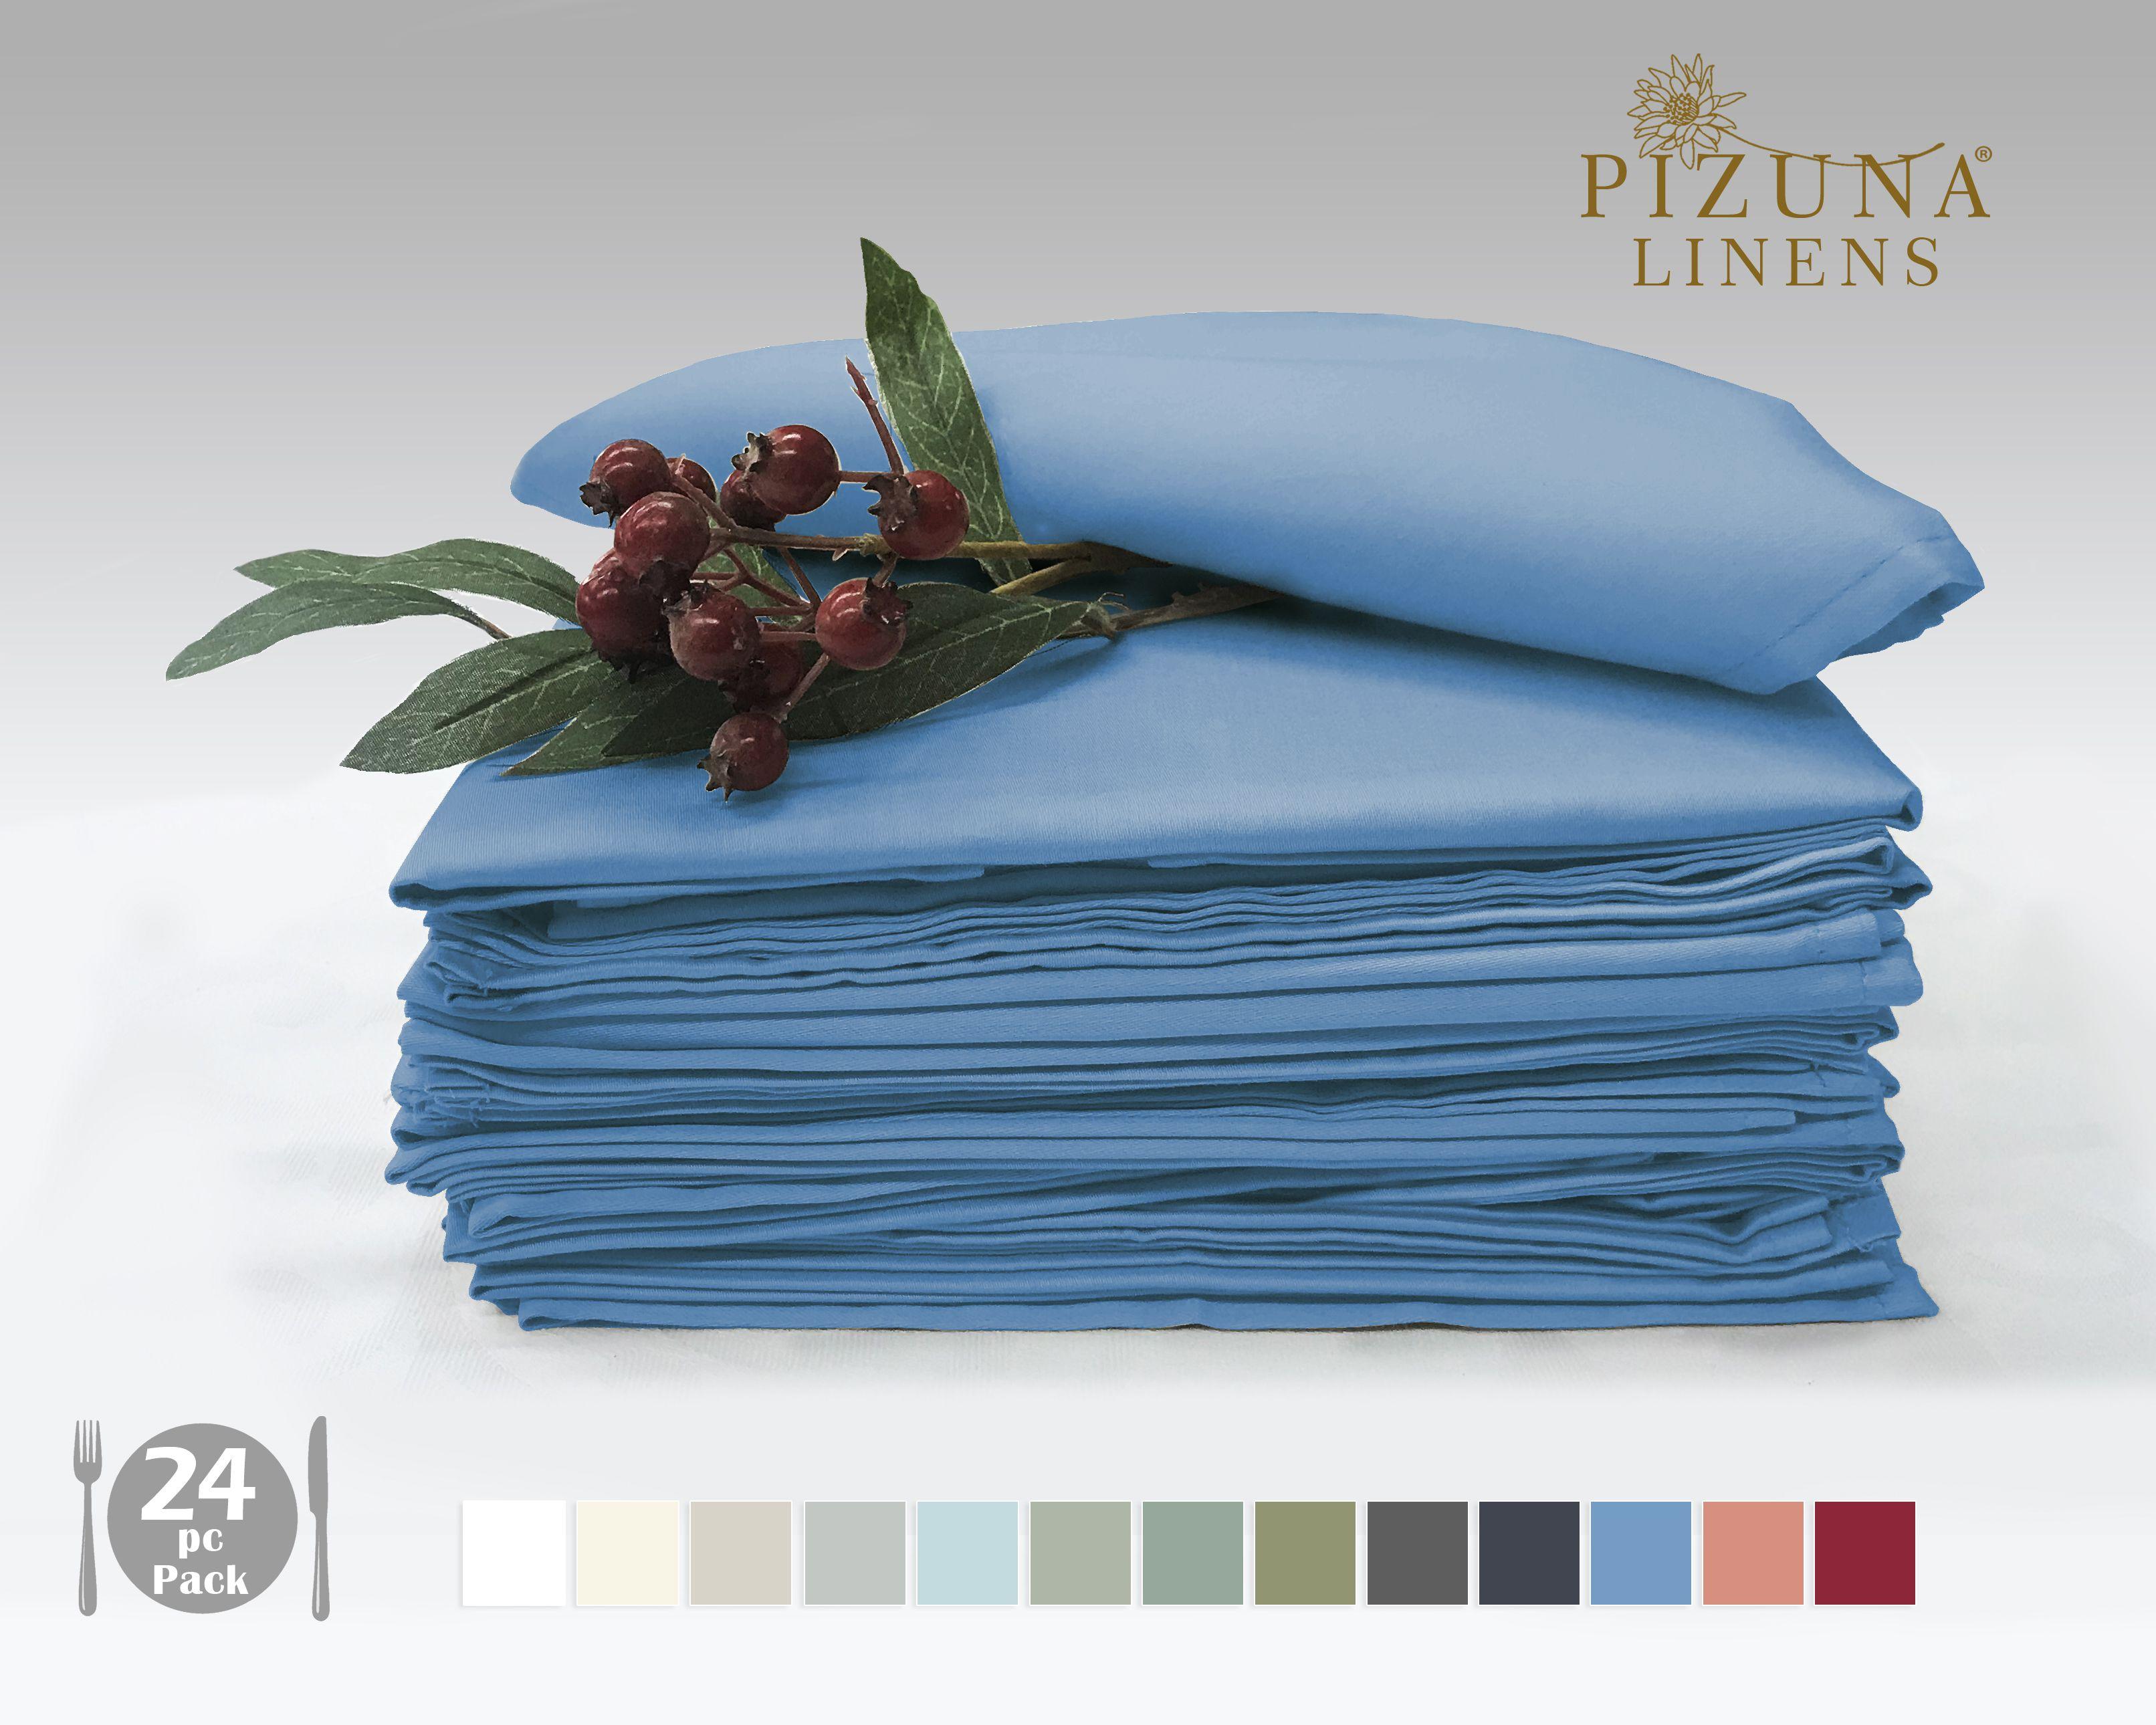 Pizuna Linens Set of 20 Cotton Napkin